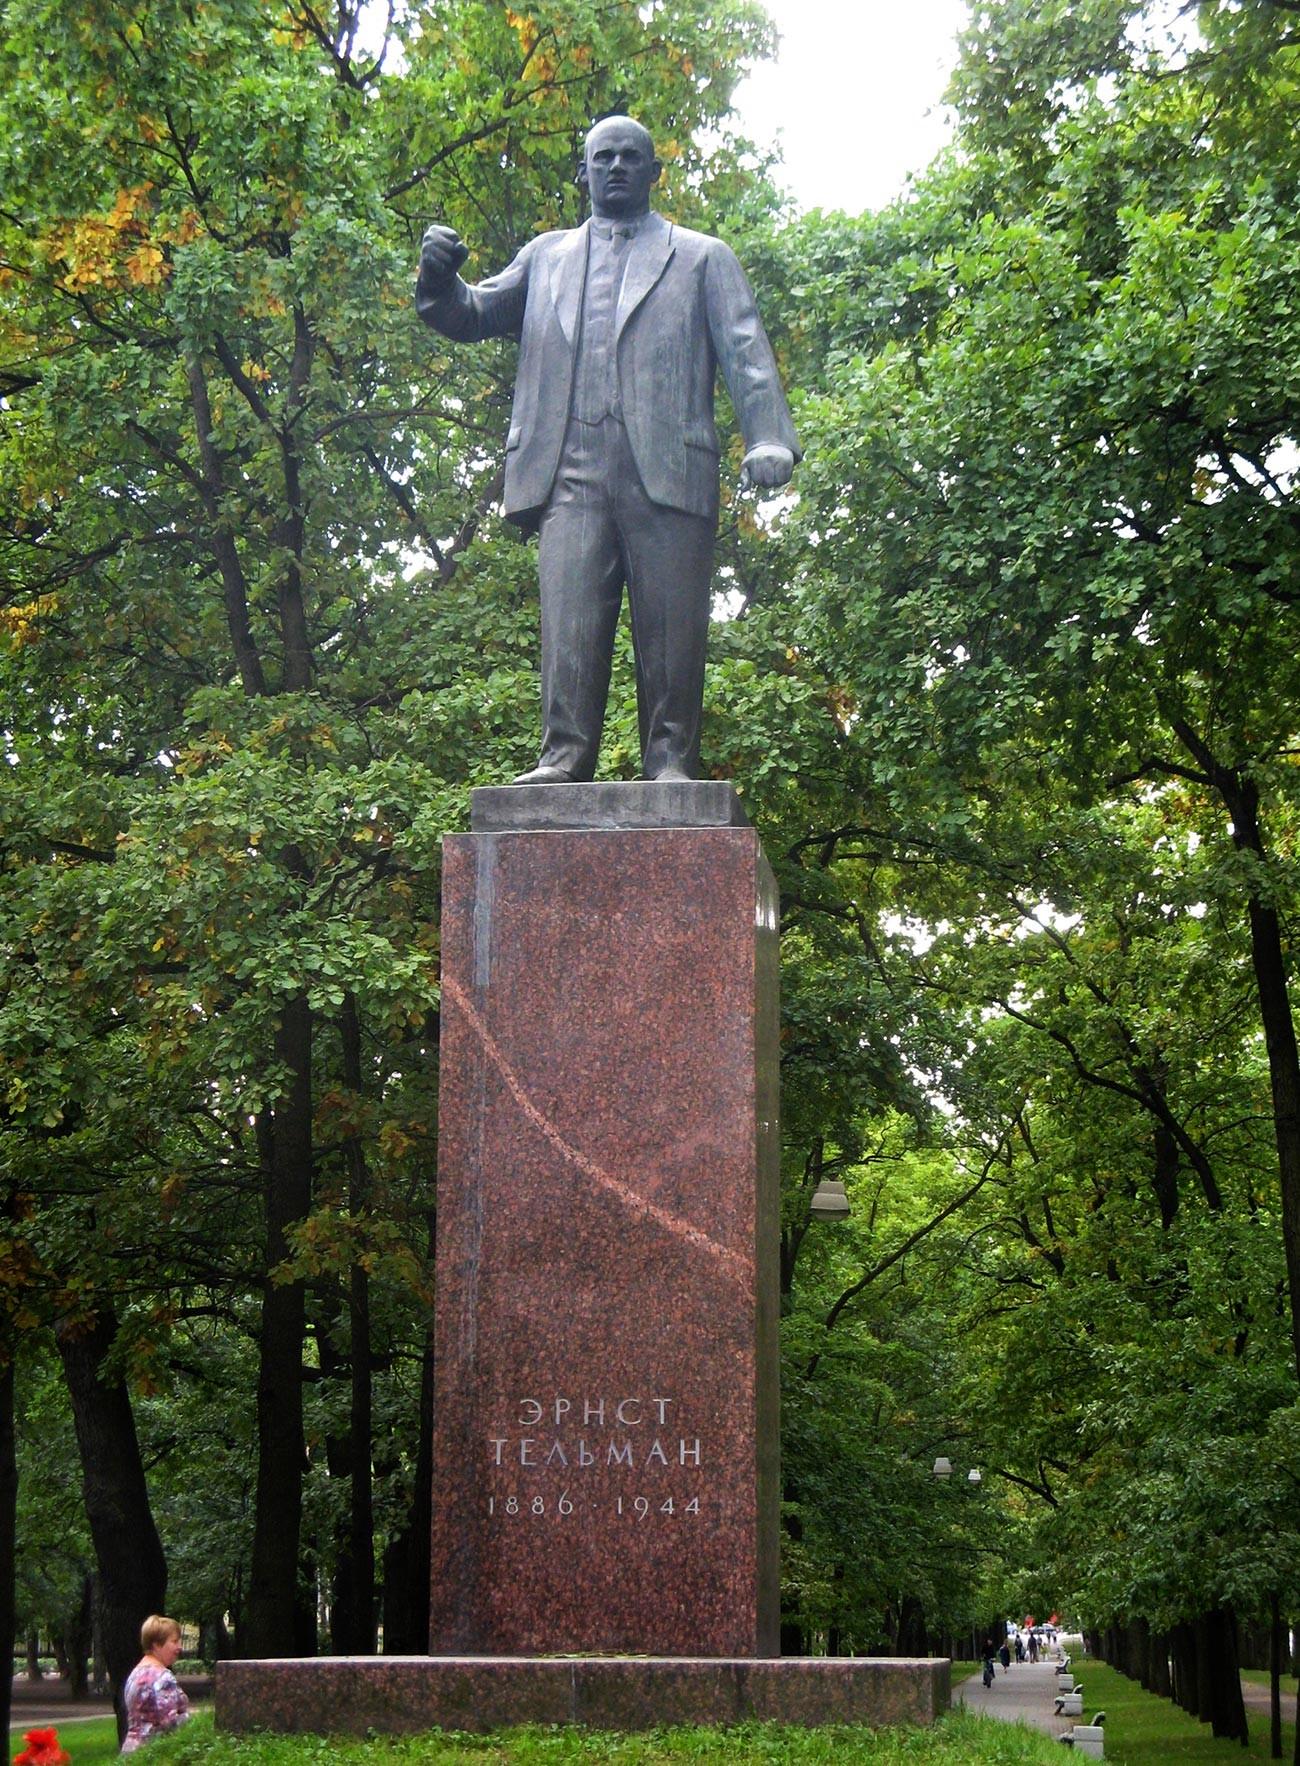 Monument au communiste allemand Ernst Thälmann sur le boulevard Sofiski